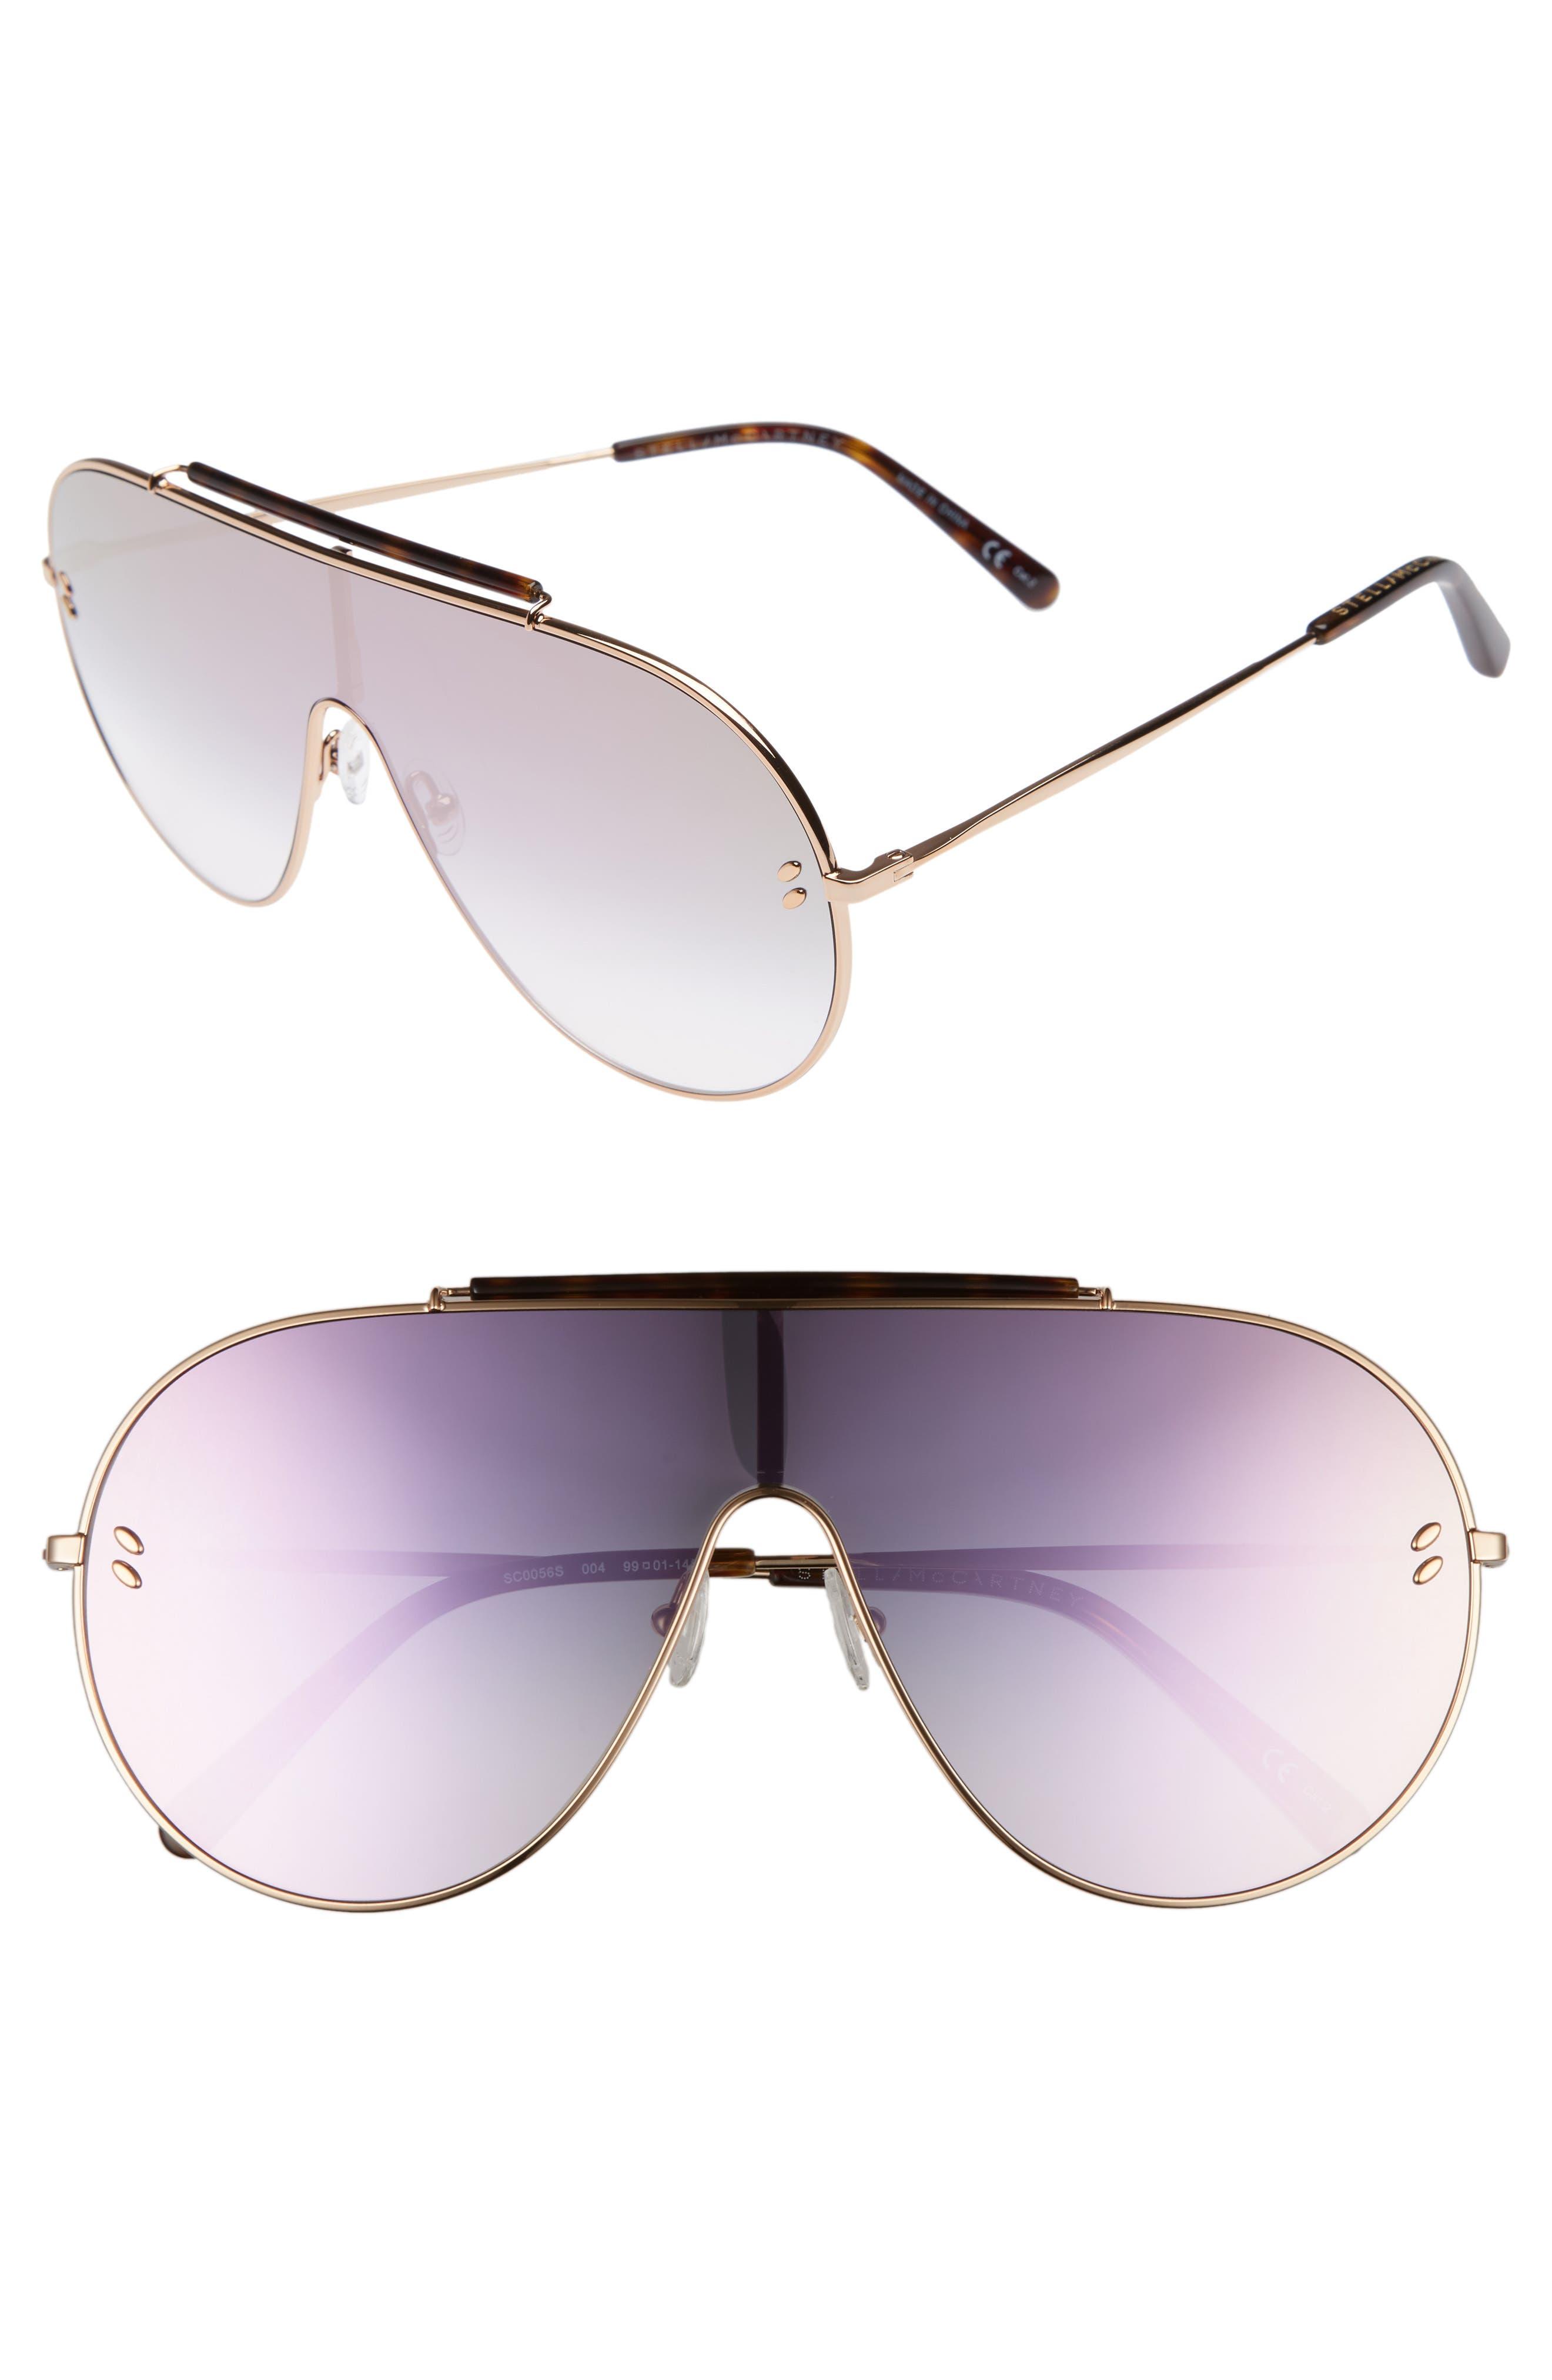 65mm Shield Sunglasses,                             Main thumbnail 1, color,                             Gold